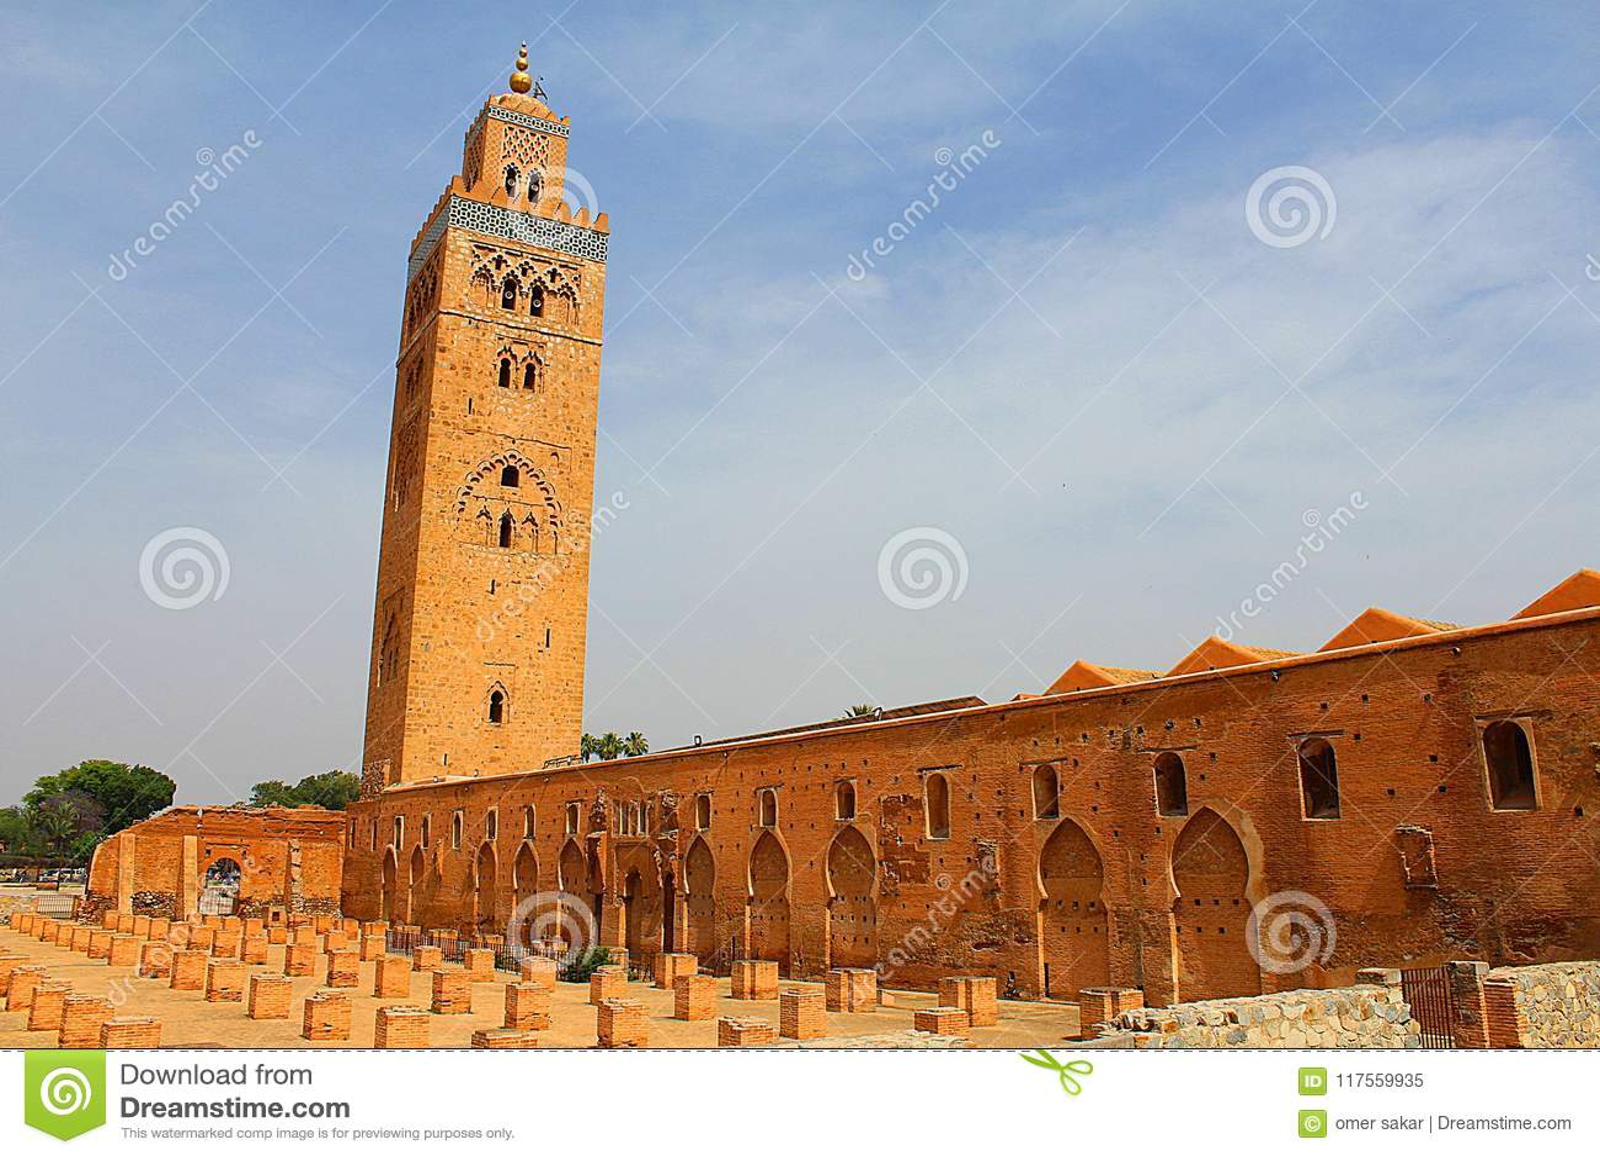 Mesquita de Cutubia de c4marraquexe Marrocos